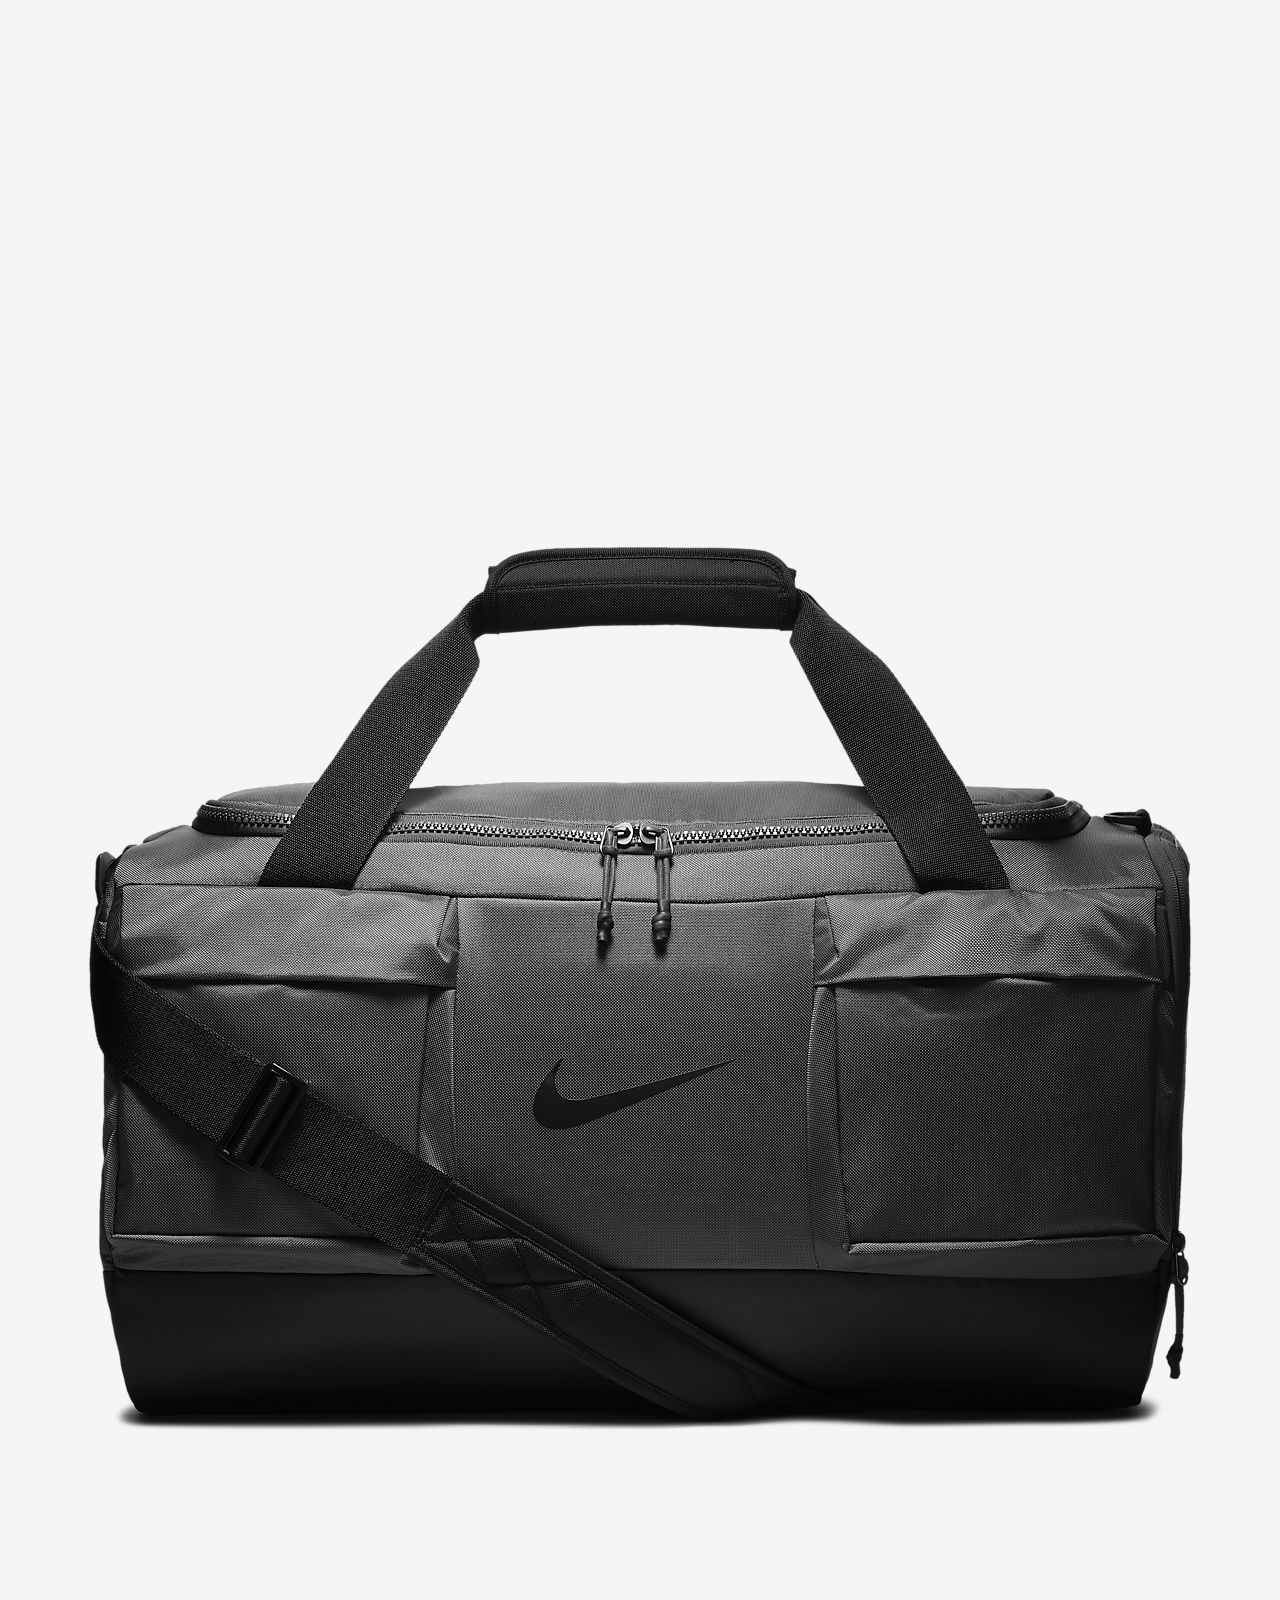 Nike Vapor Power Bolsa de deporte de entrenamiento (mediana) - Hombre